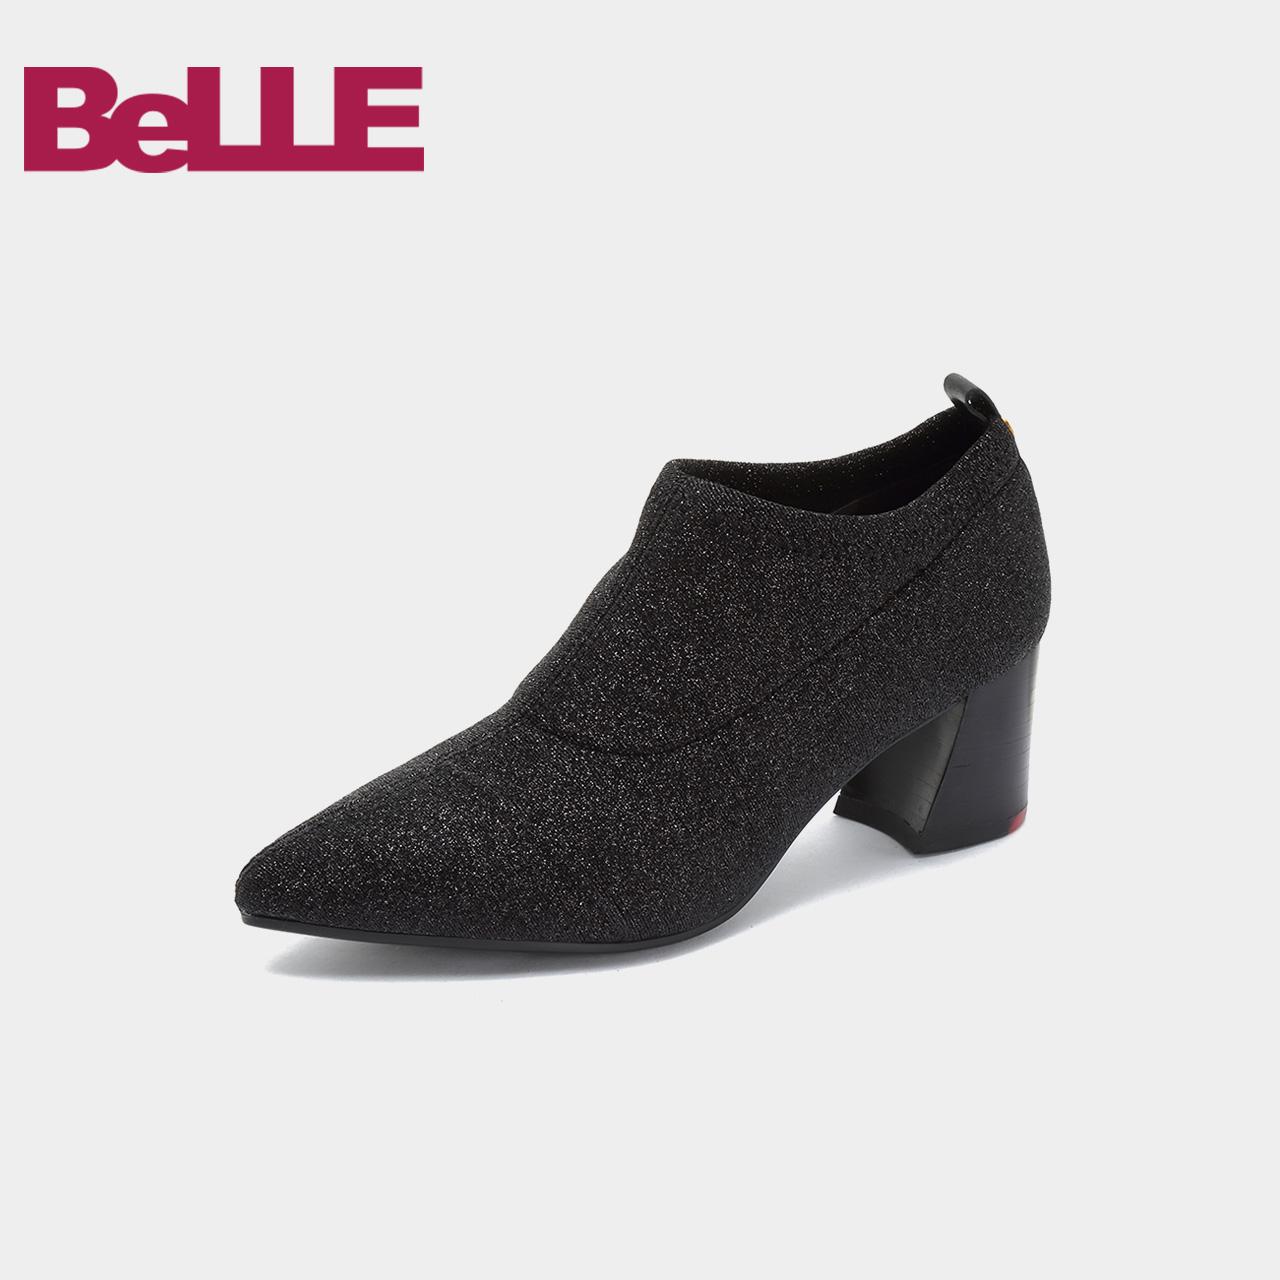 Belle-百丽2018秋商场同款闪光粗高跟尖头女单鞋BYN25CM8